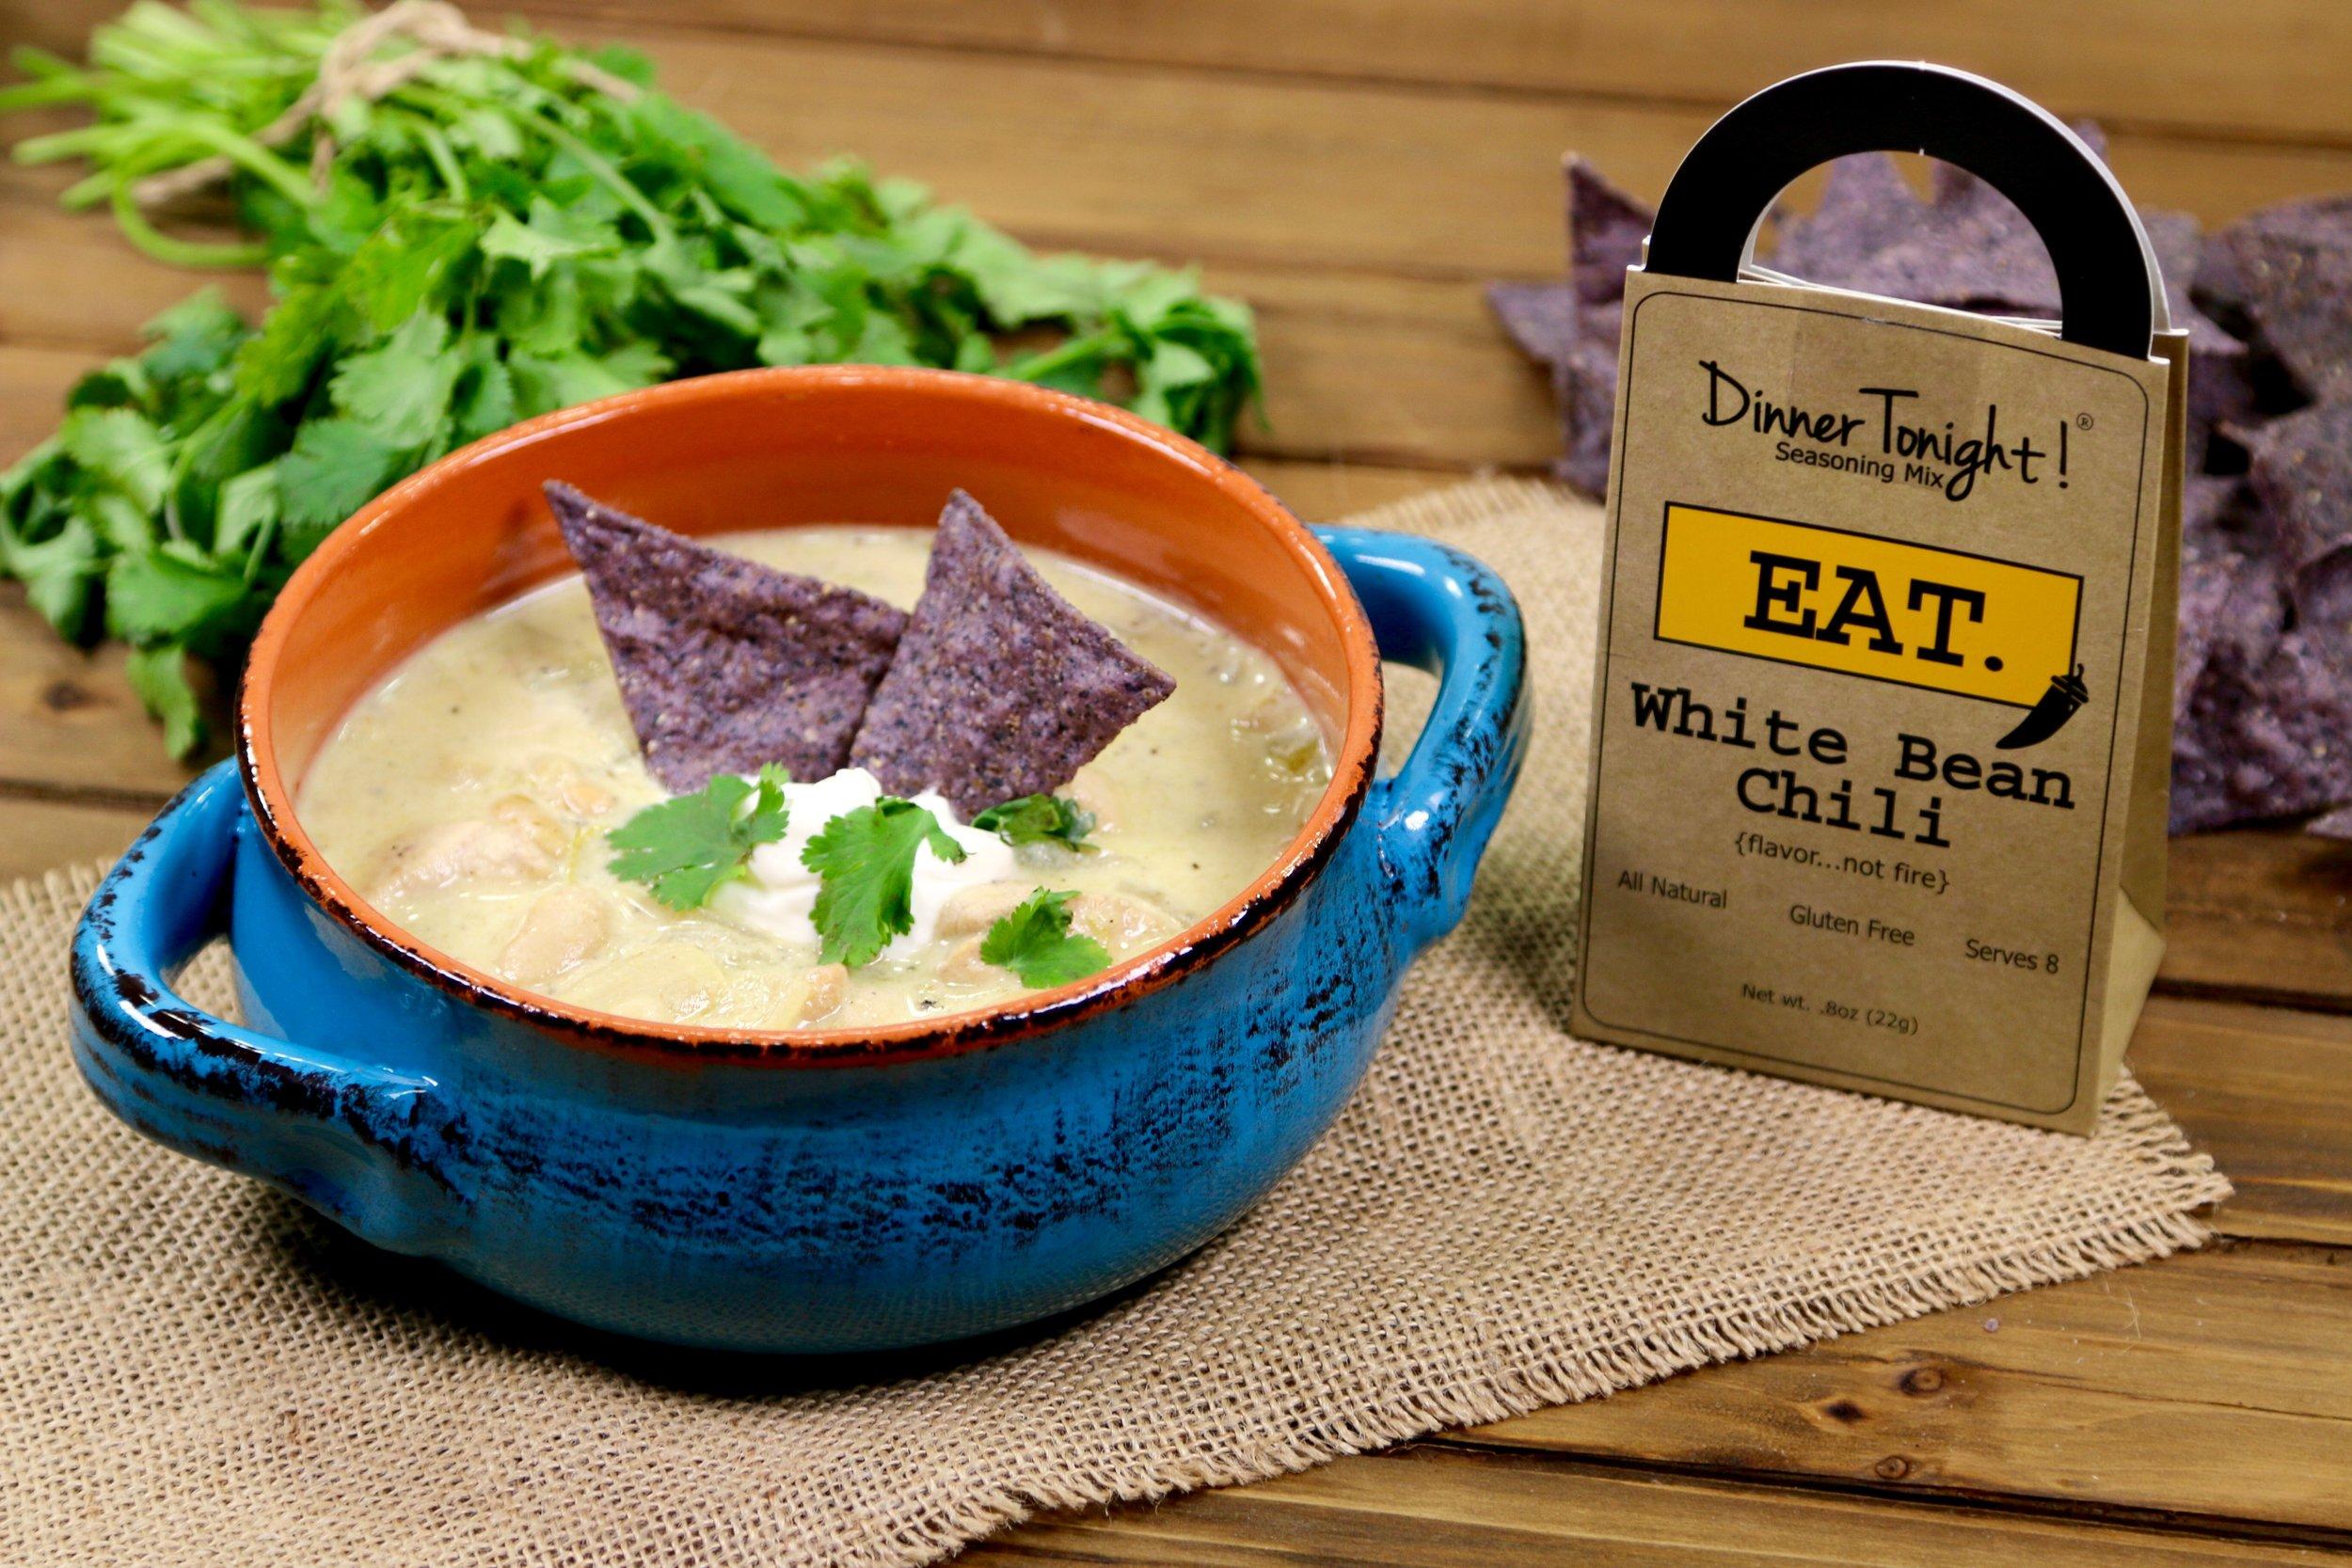 White Bean Chili Recipe & Video -